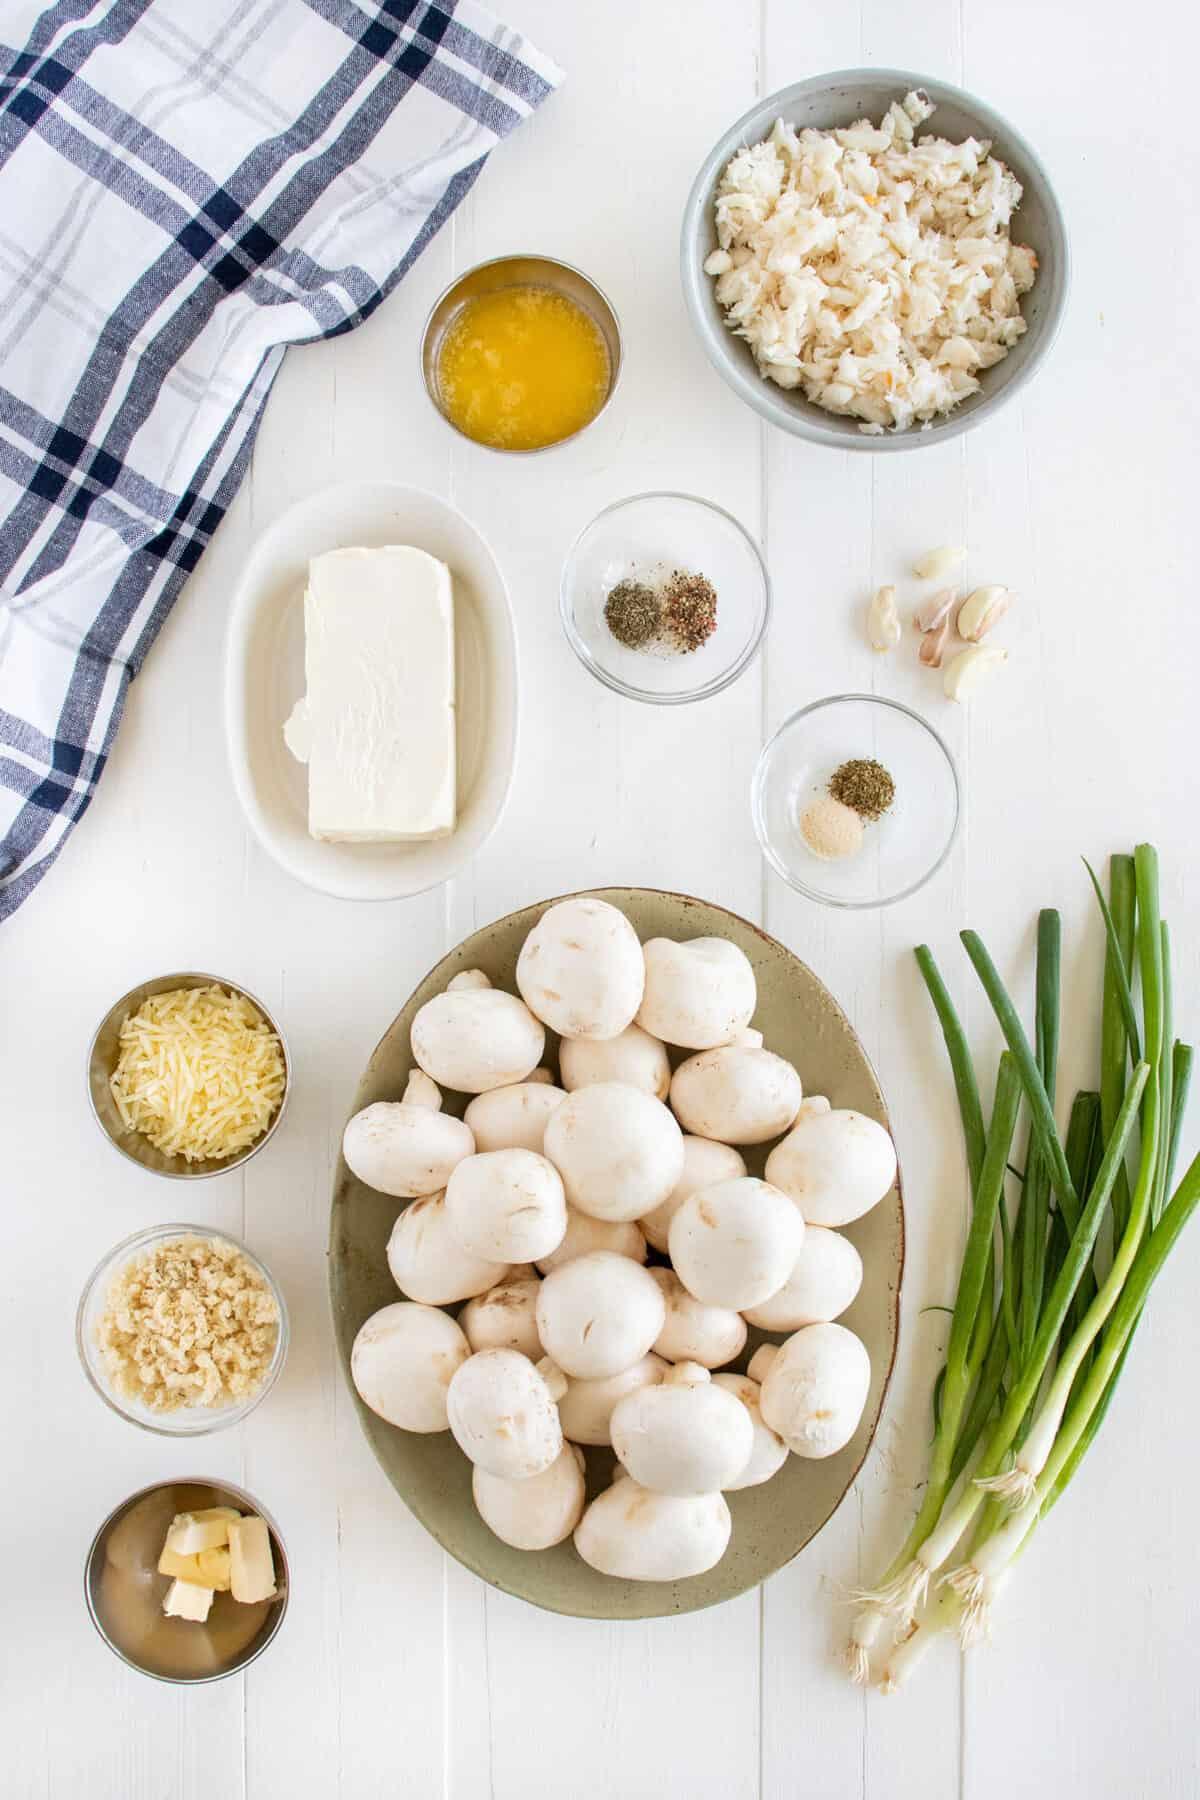 ingredients for crab stuffed mushrooms